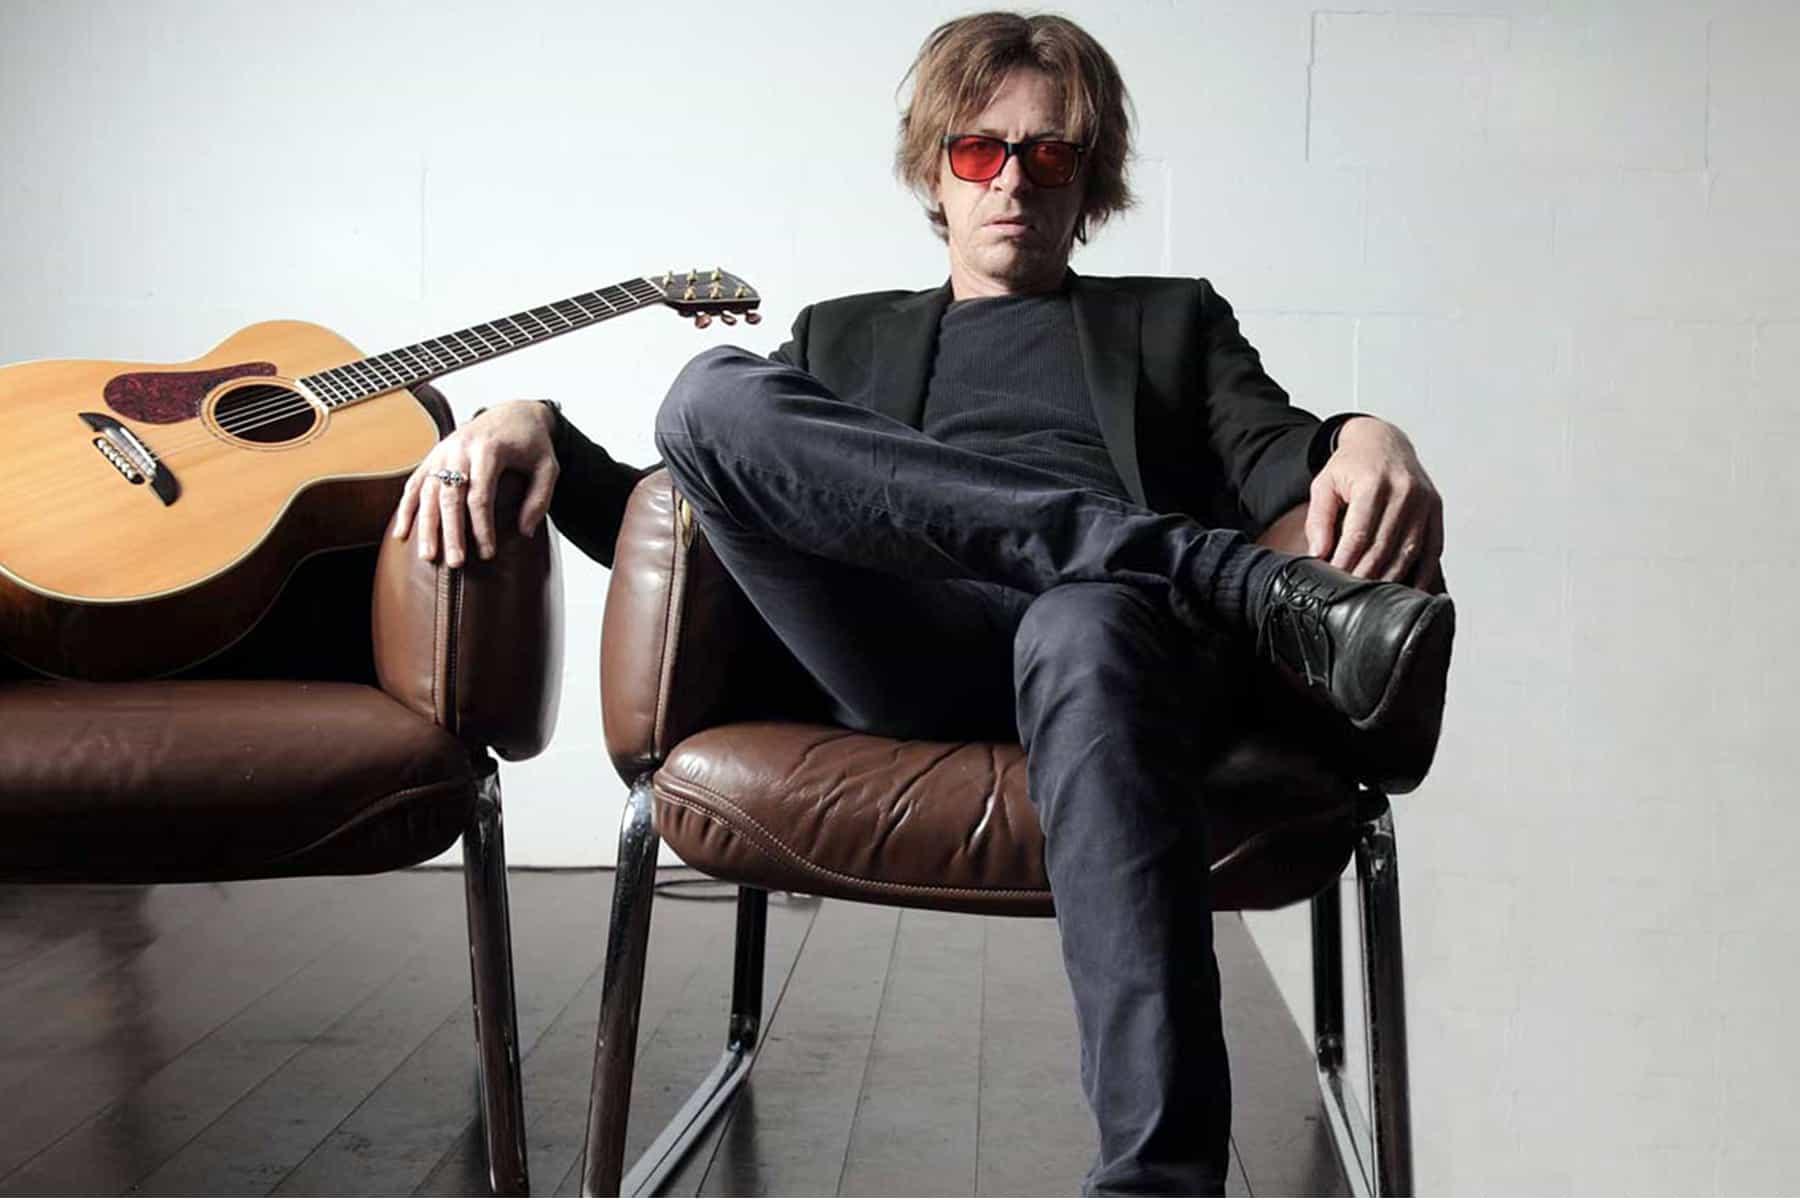 Guitarist Dominic Miller